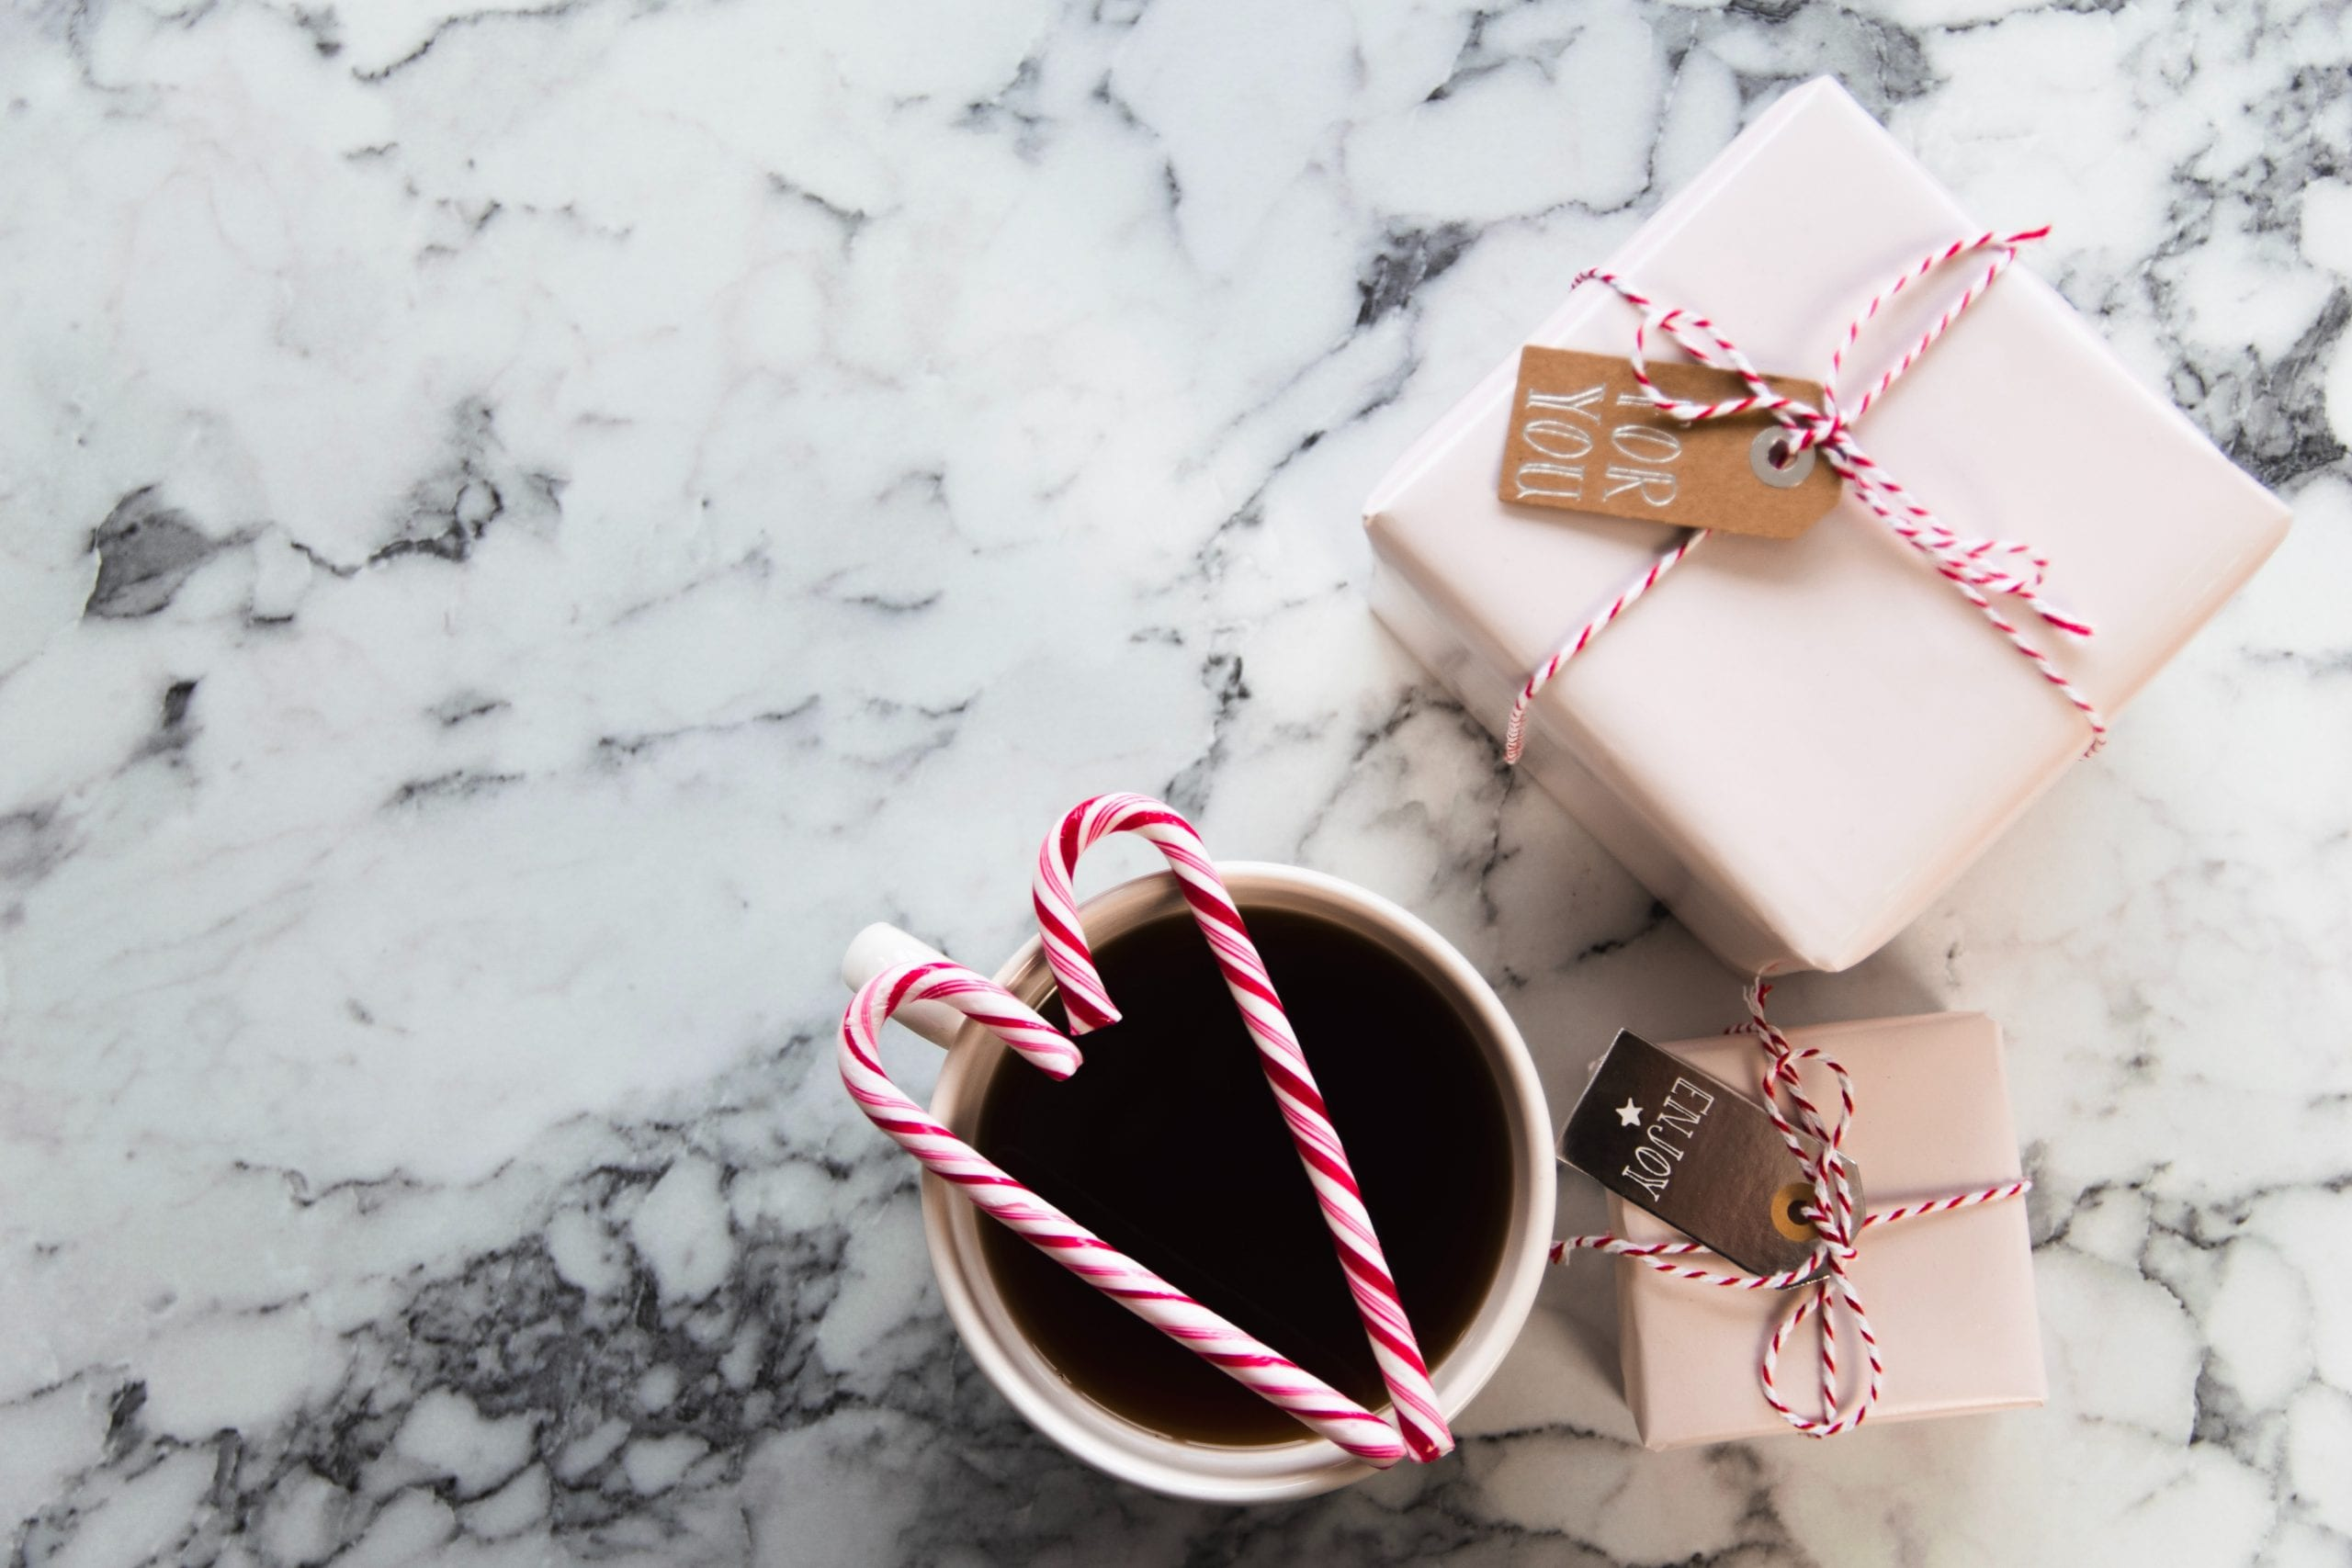 mug with coffee next to 2 white gift boxes & 2 sugar canes on the coffee mug